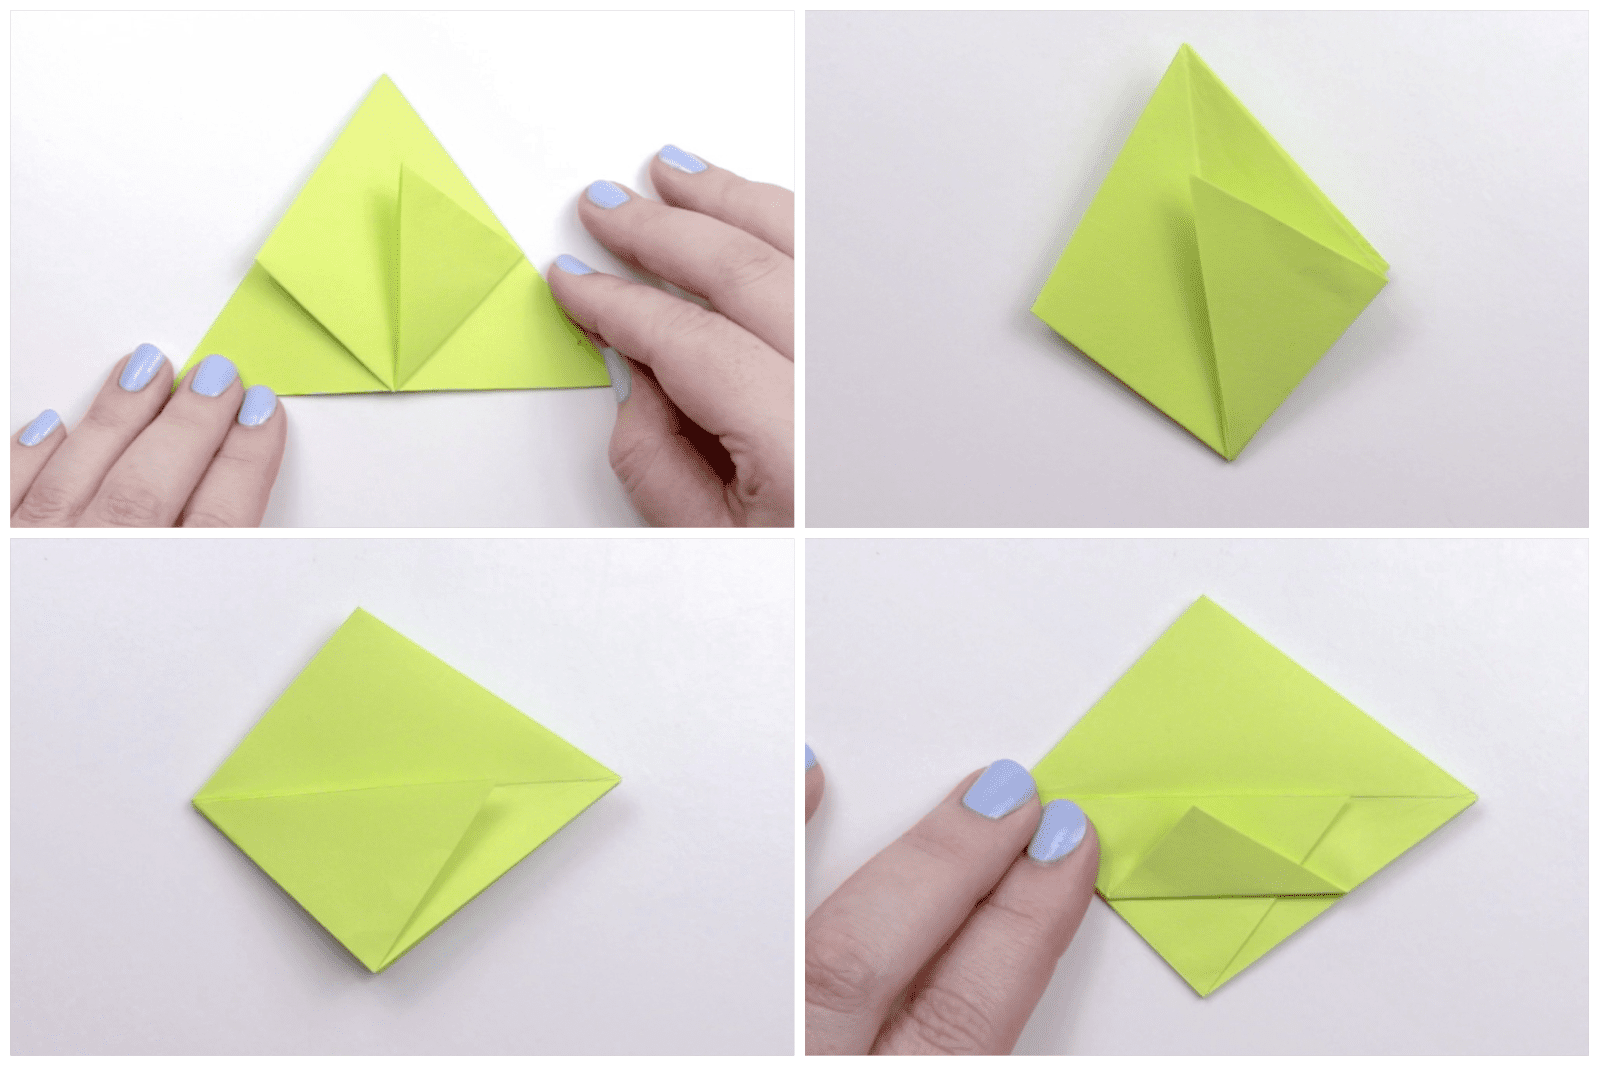 Folding the paper into a diamond shape.